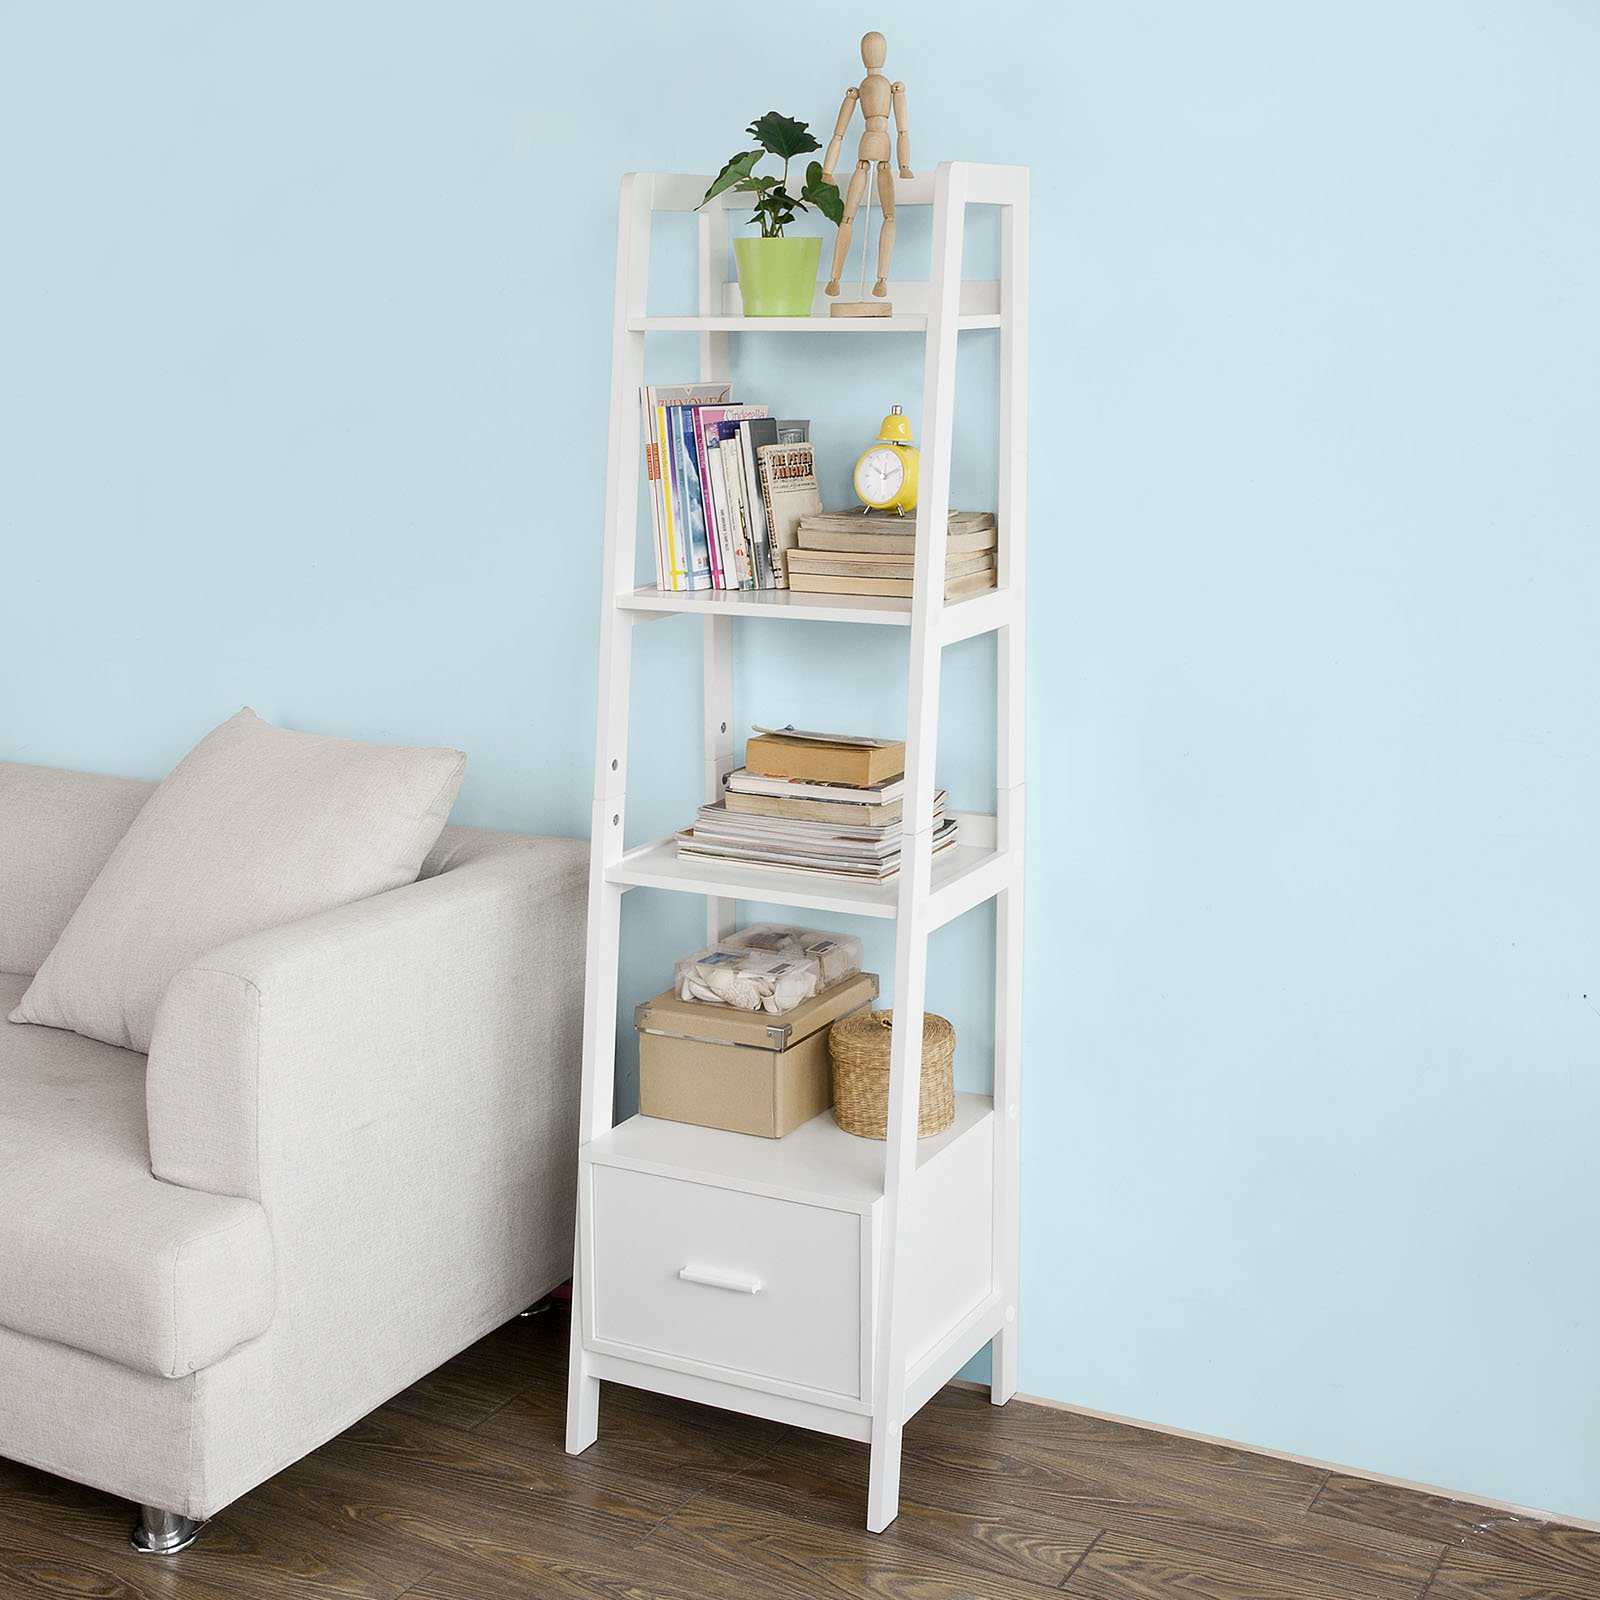 SoBuy Haotian Modern ladder bookcase made of wood, book shelf,stand shelf, wall shelf (FRG116-K-W)